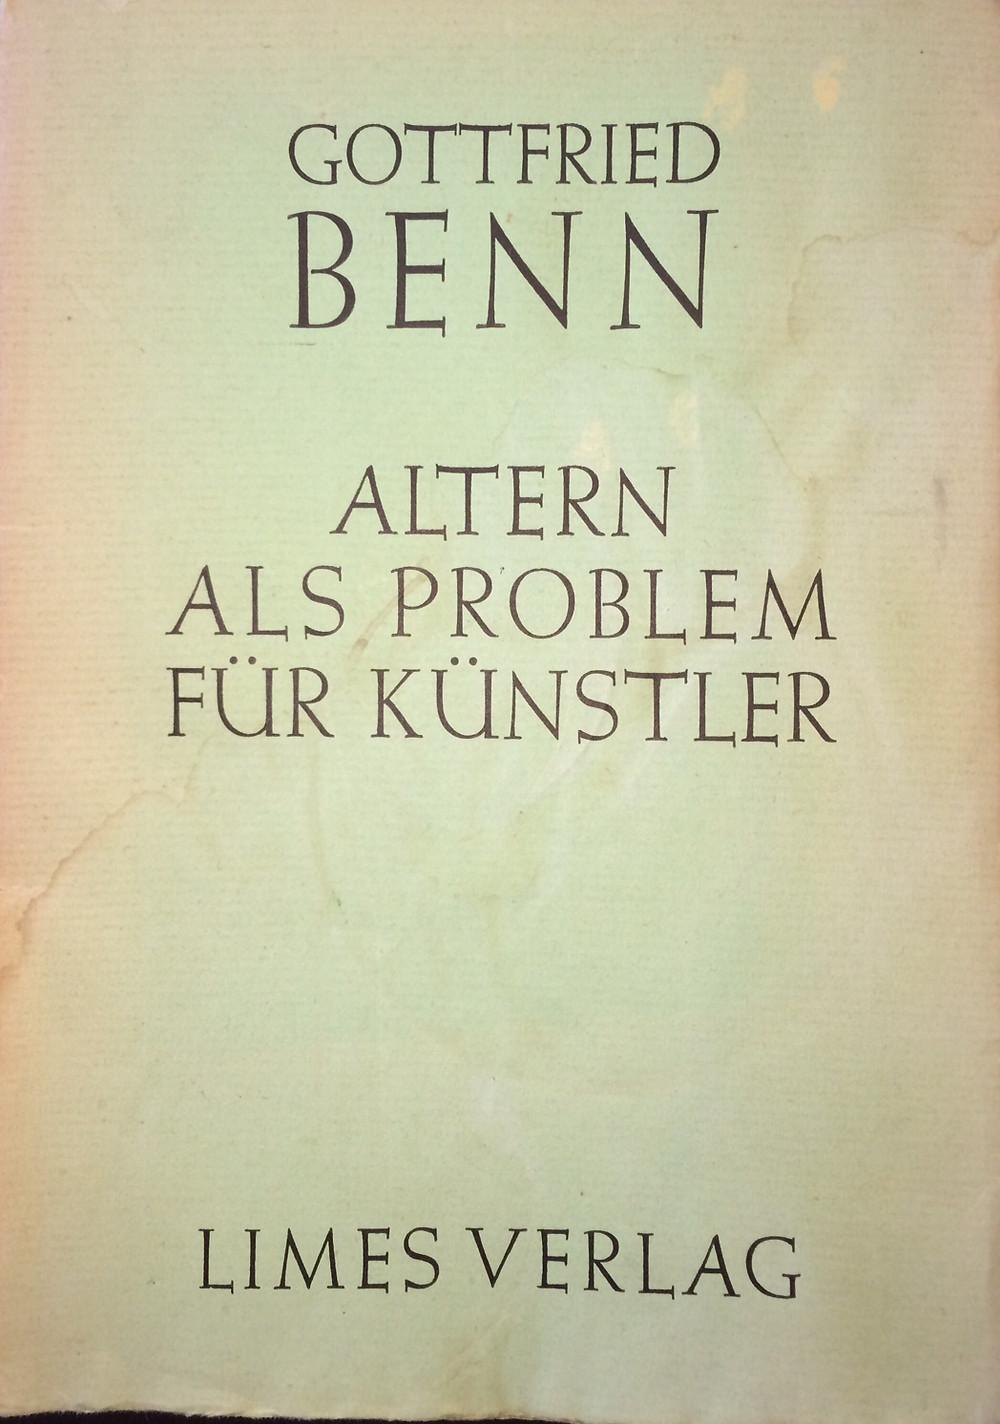 Gottfried Benn.jpg